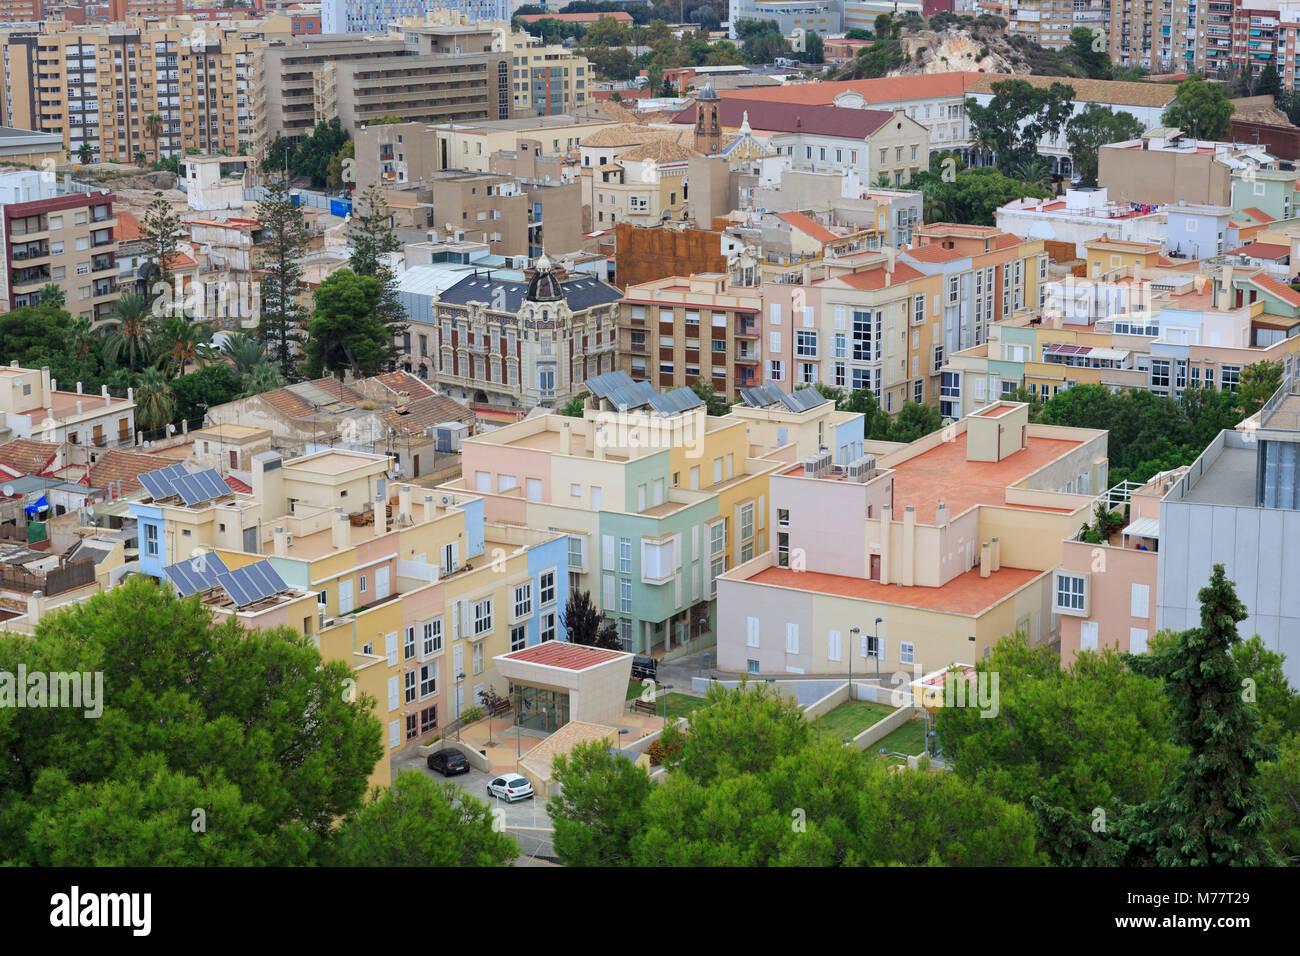 Cartagena, Murcia, Spagna, Europa Immagini Stock